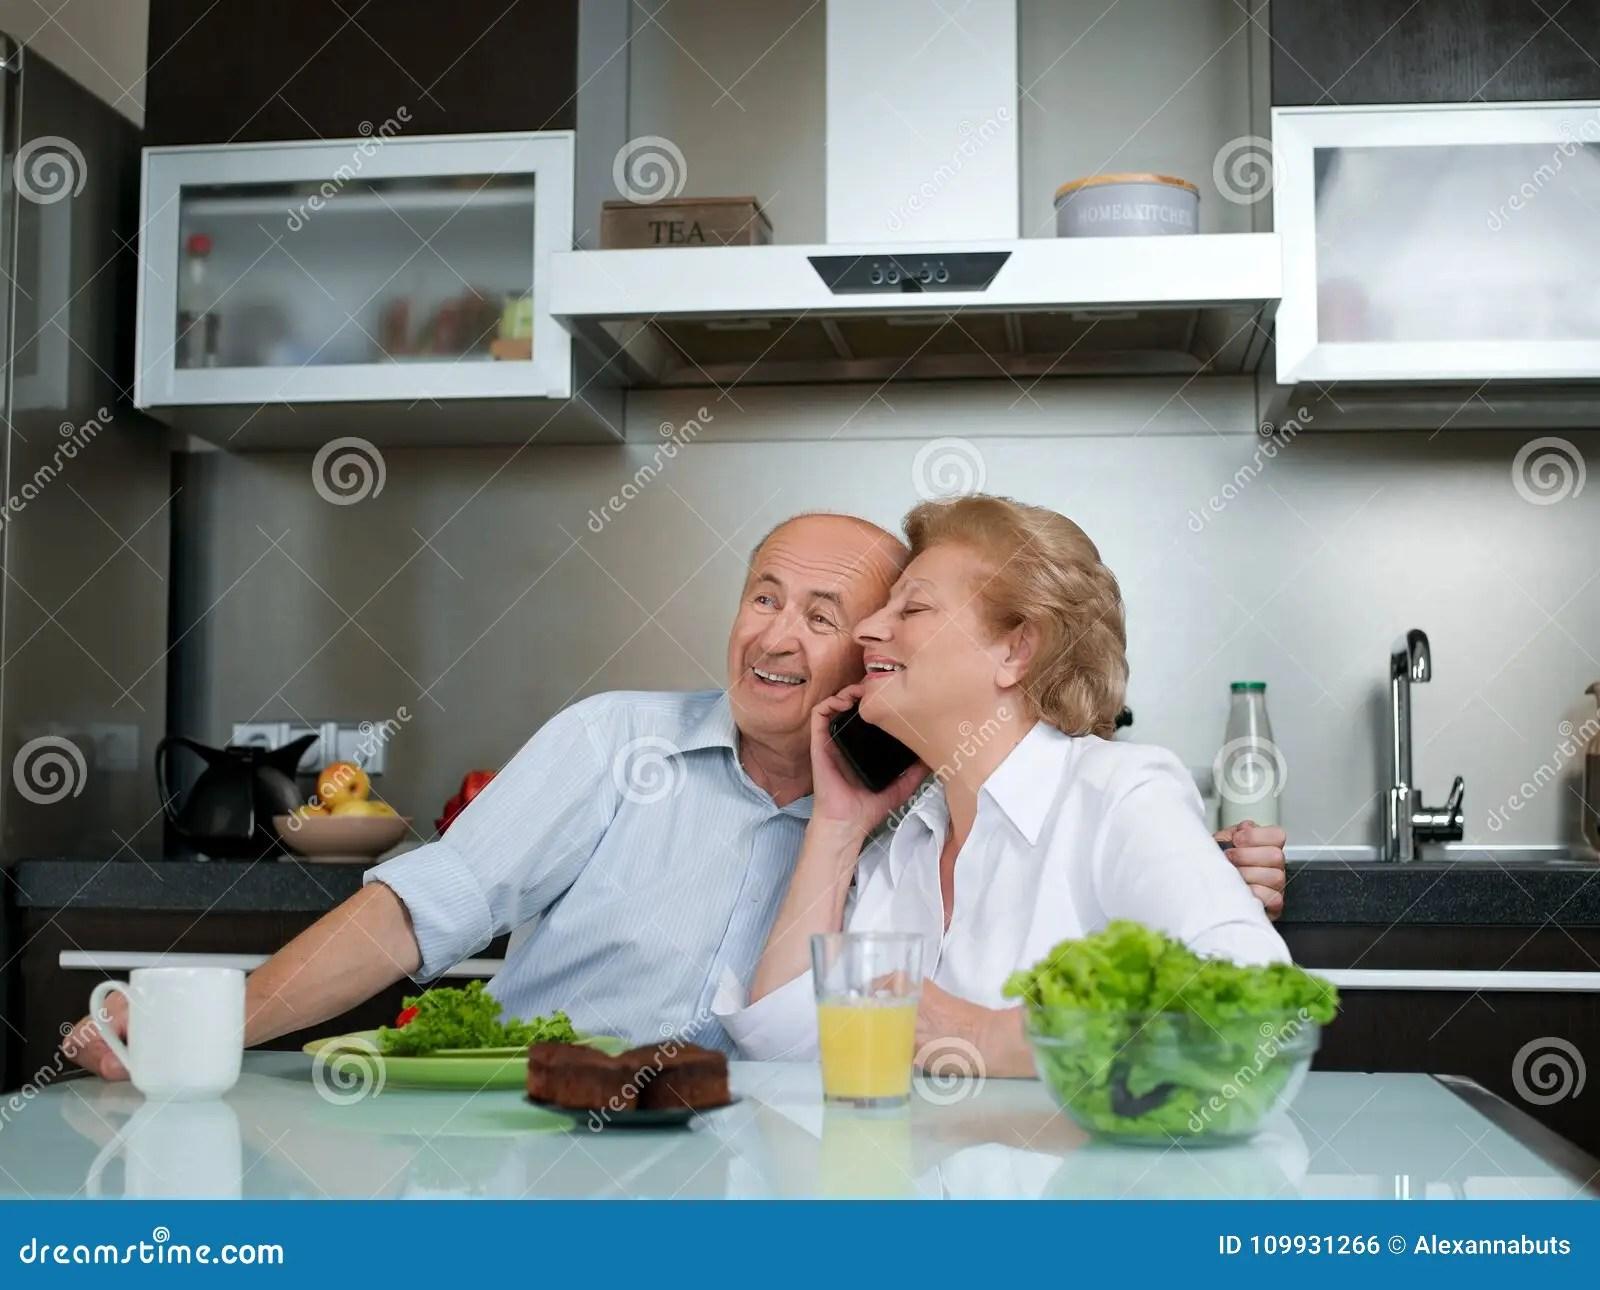 kitchen phone large islands for sale 资深妇女谈话在电话 当在家时工作在厨房里的人库存照片 图片包括有休闲 当在家时工作在厨房里的人